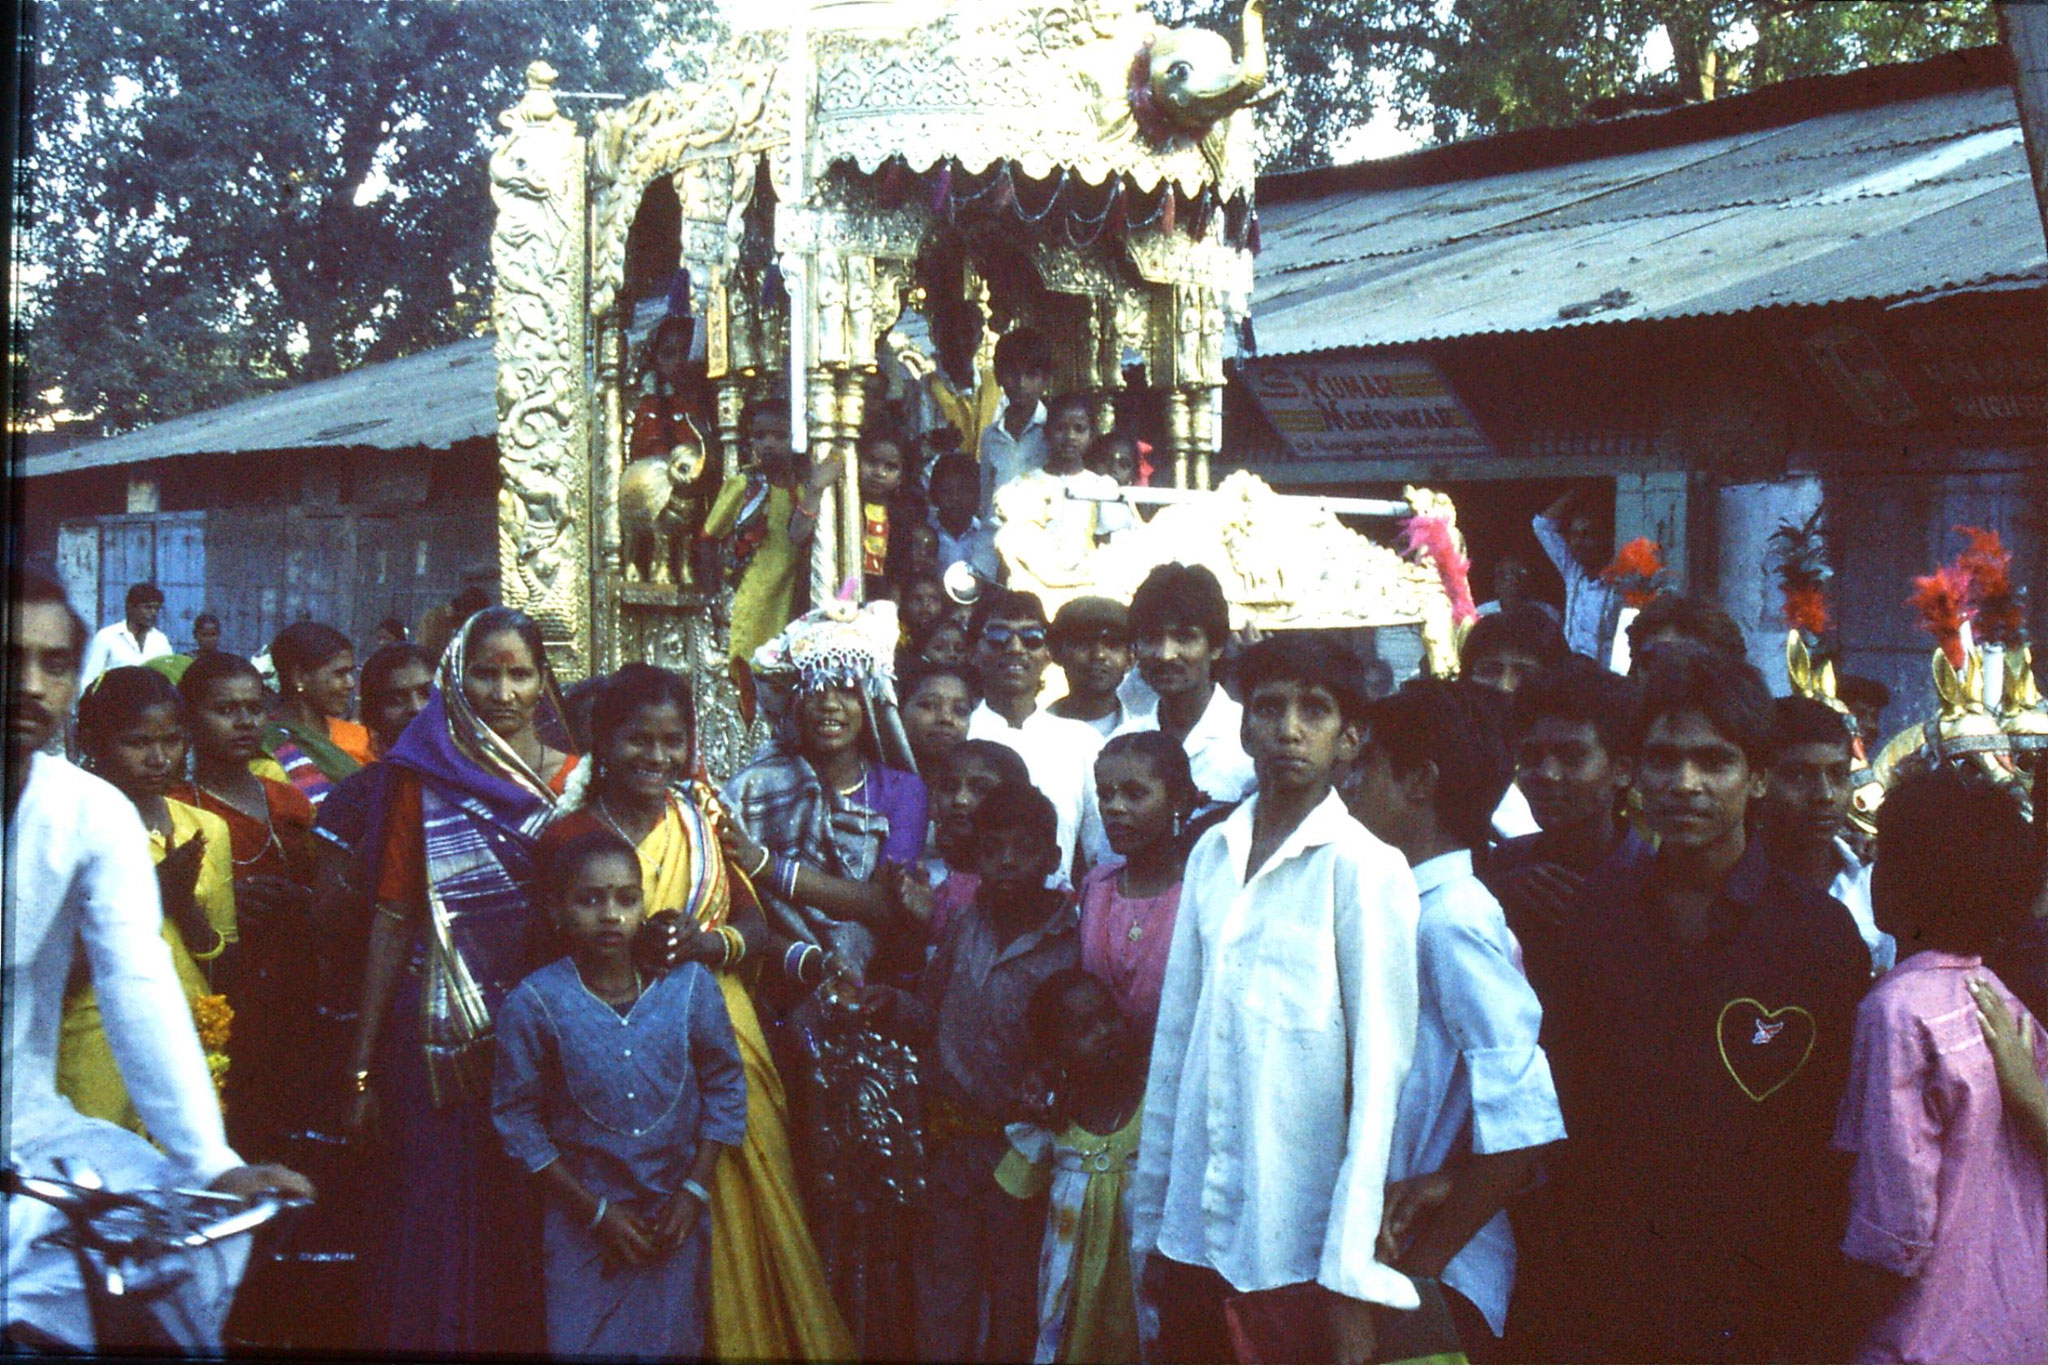 10/12/1989: 35: Ahmedabad wedding procession